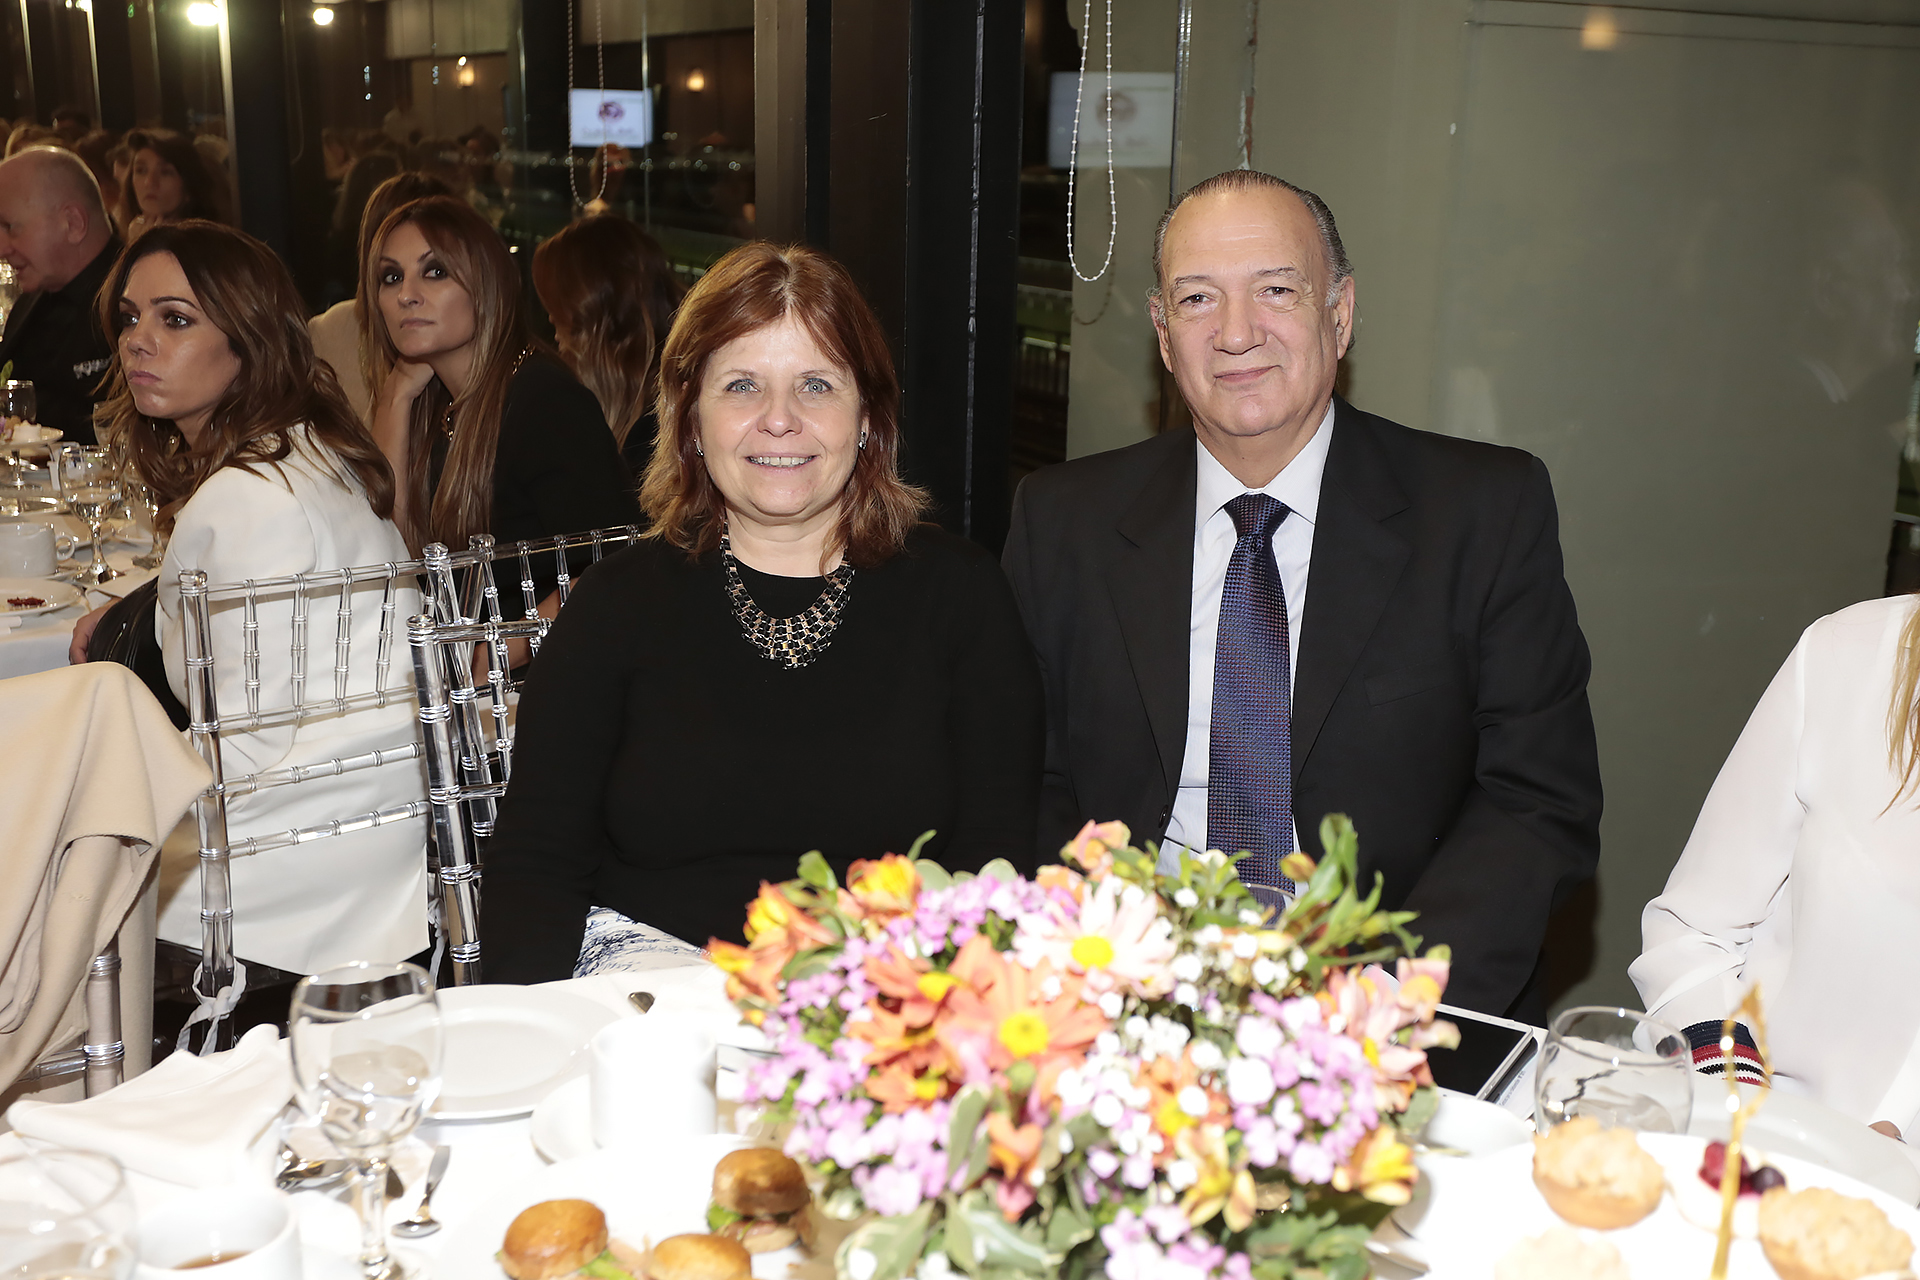 Eduardo Fernández Rostello, director del Hospital Bernardino Rivadavia; y Ana María Bou Pérez, ministra de Salud porteña